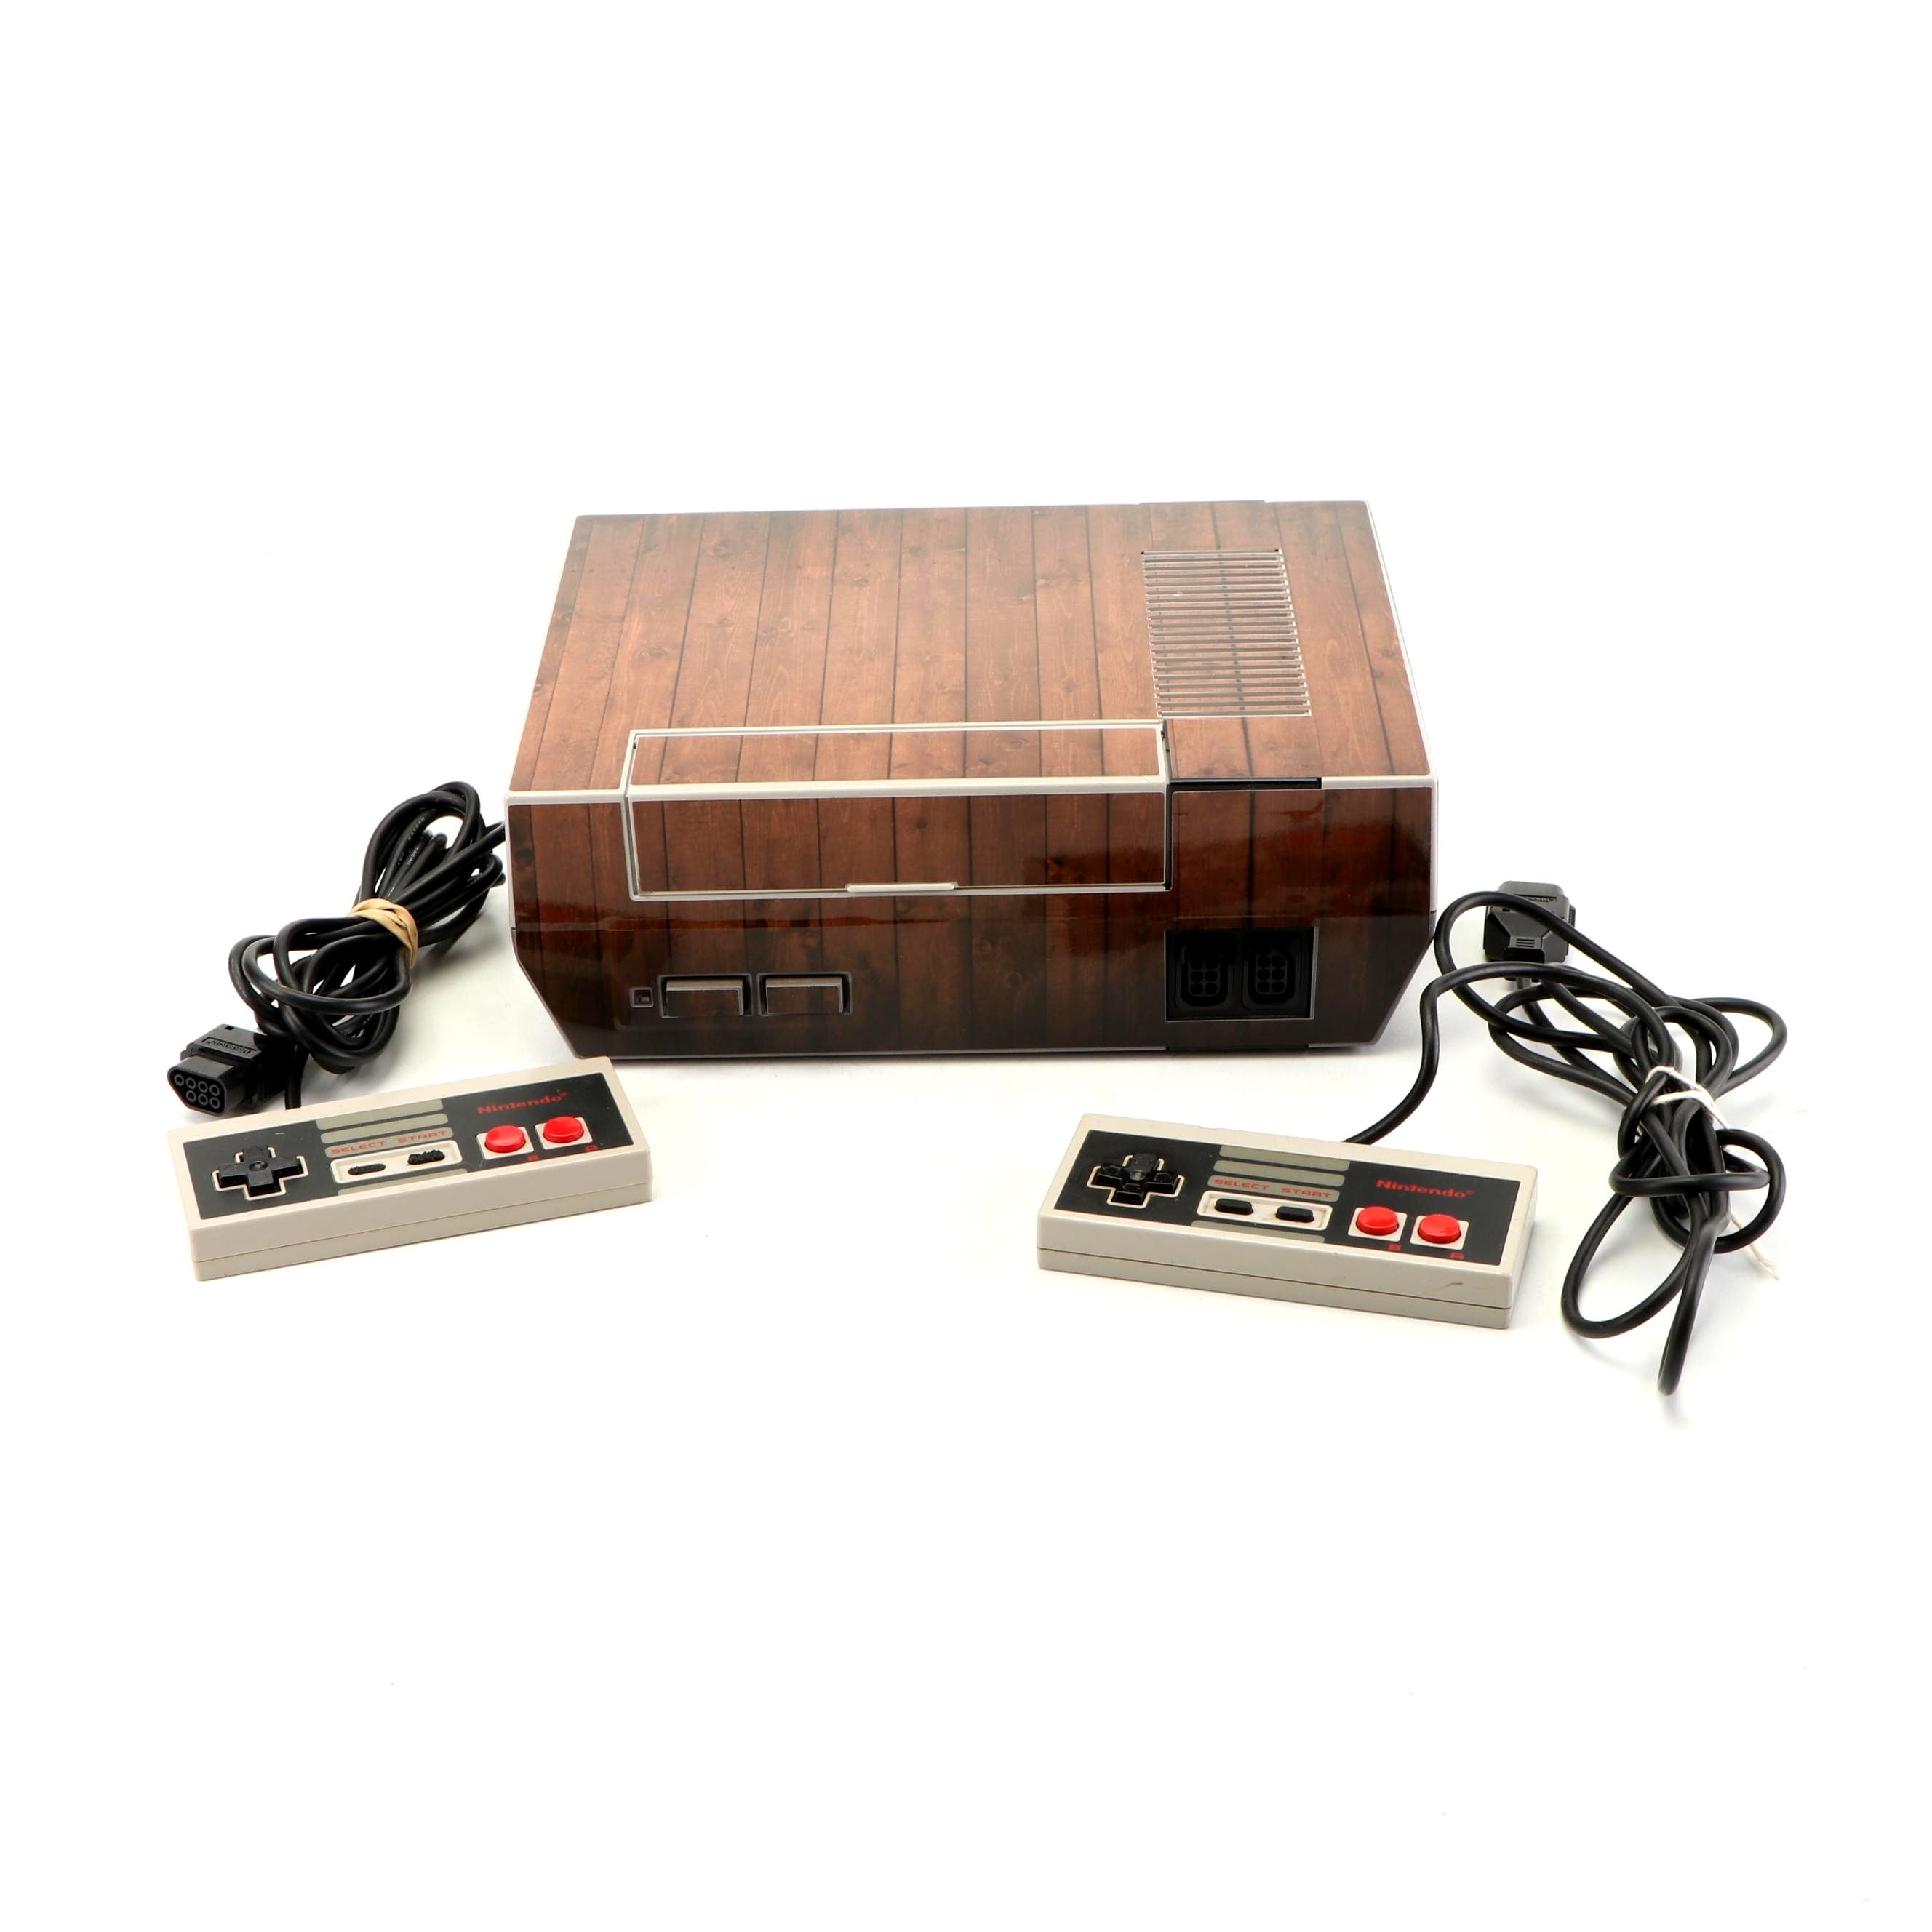 Nintendo Entertainment System, Model NES-001